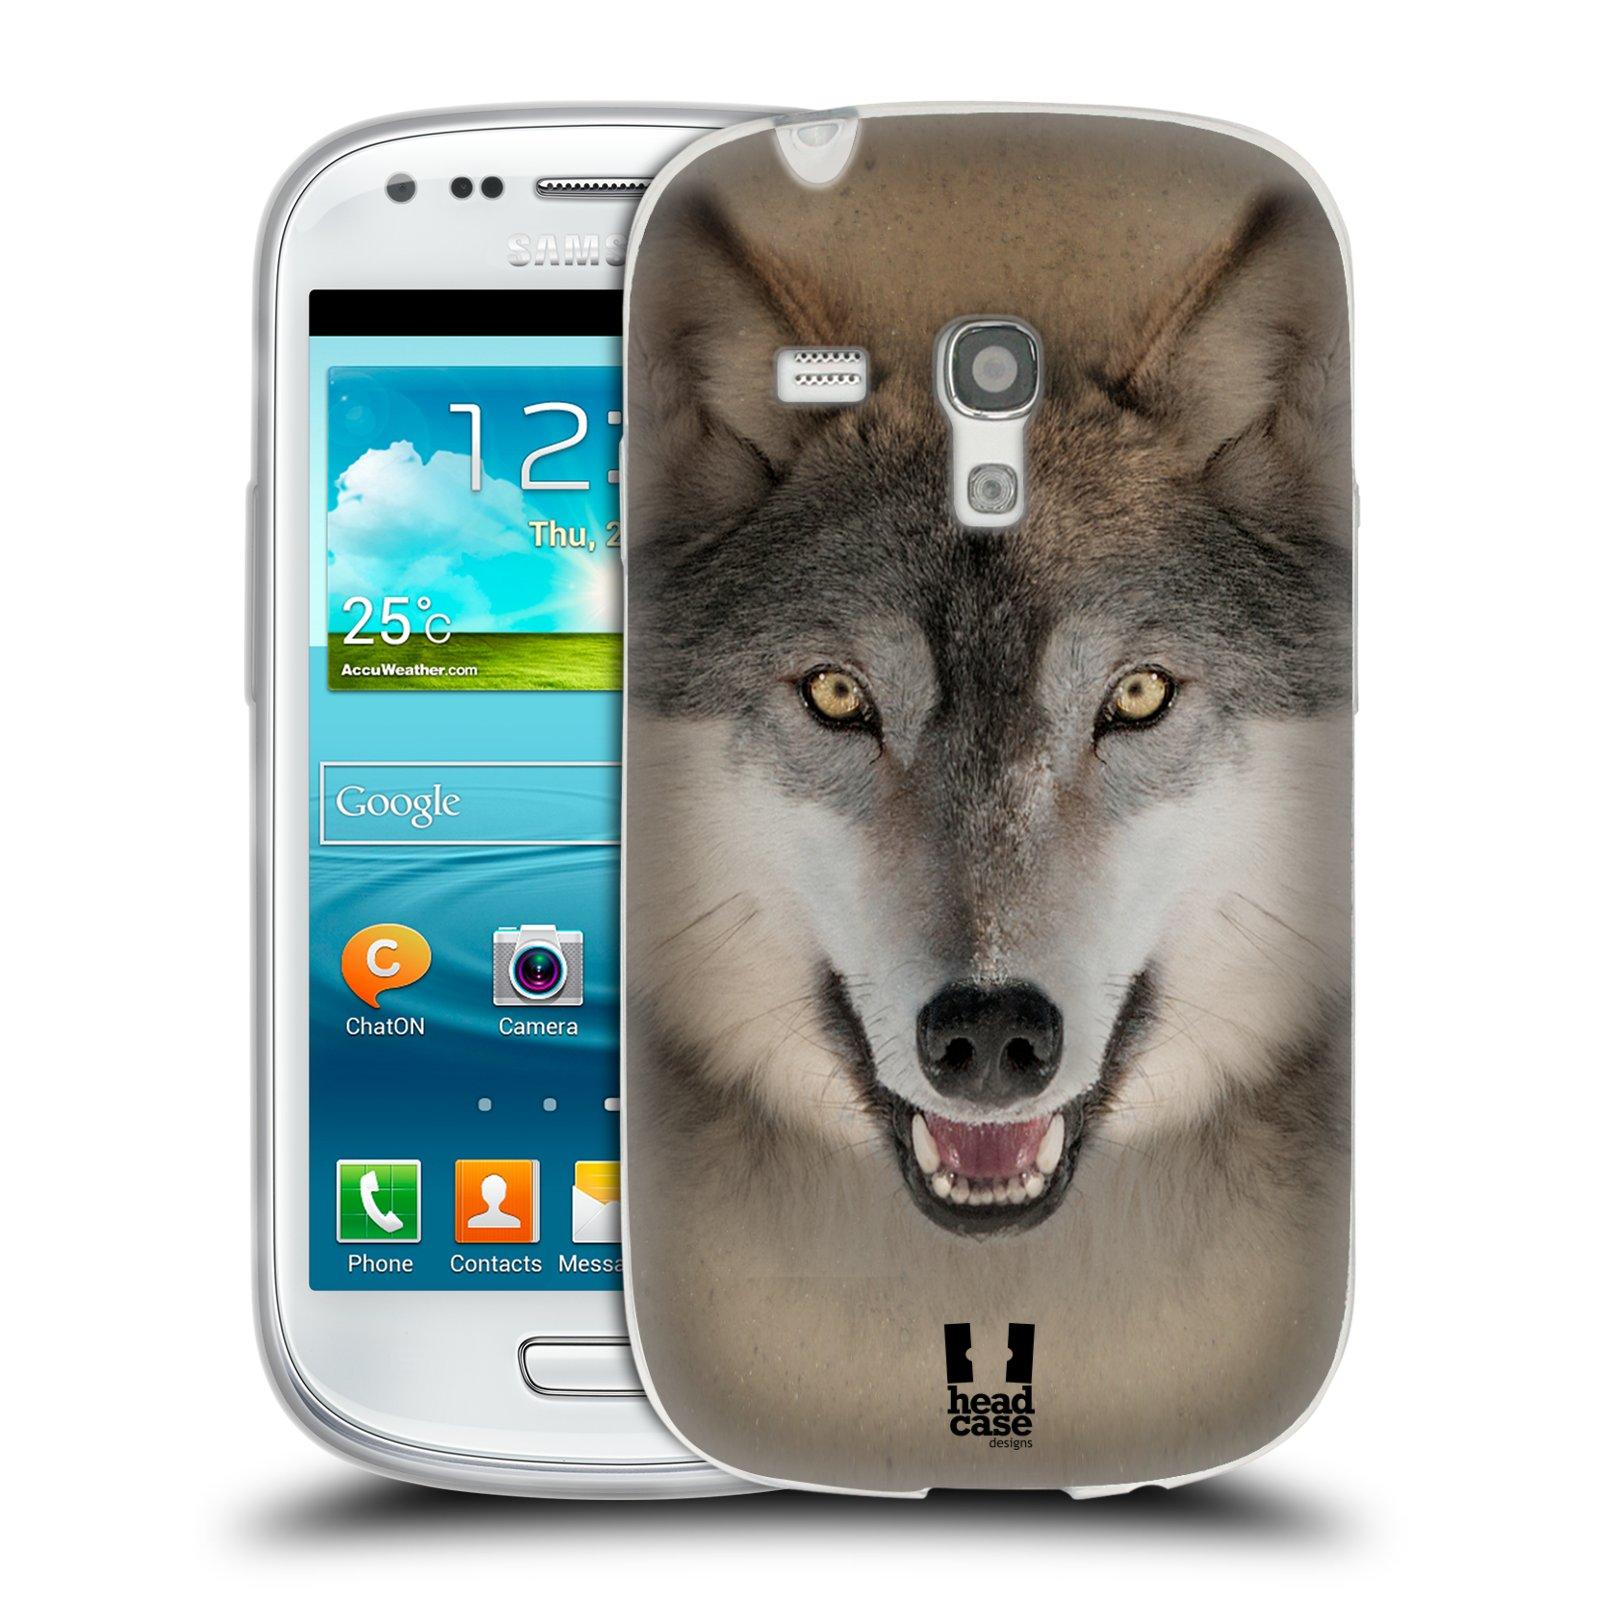 HEAD CASE silikonový obal na mobil Samsung Galaxy S3 MINI i8190 vzor Zvířecí tváře 2 vlk šedý